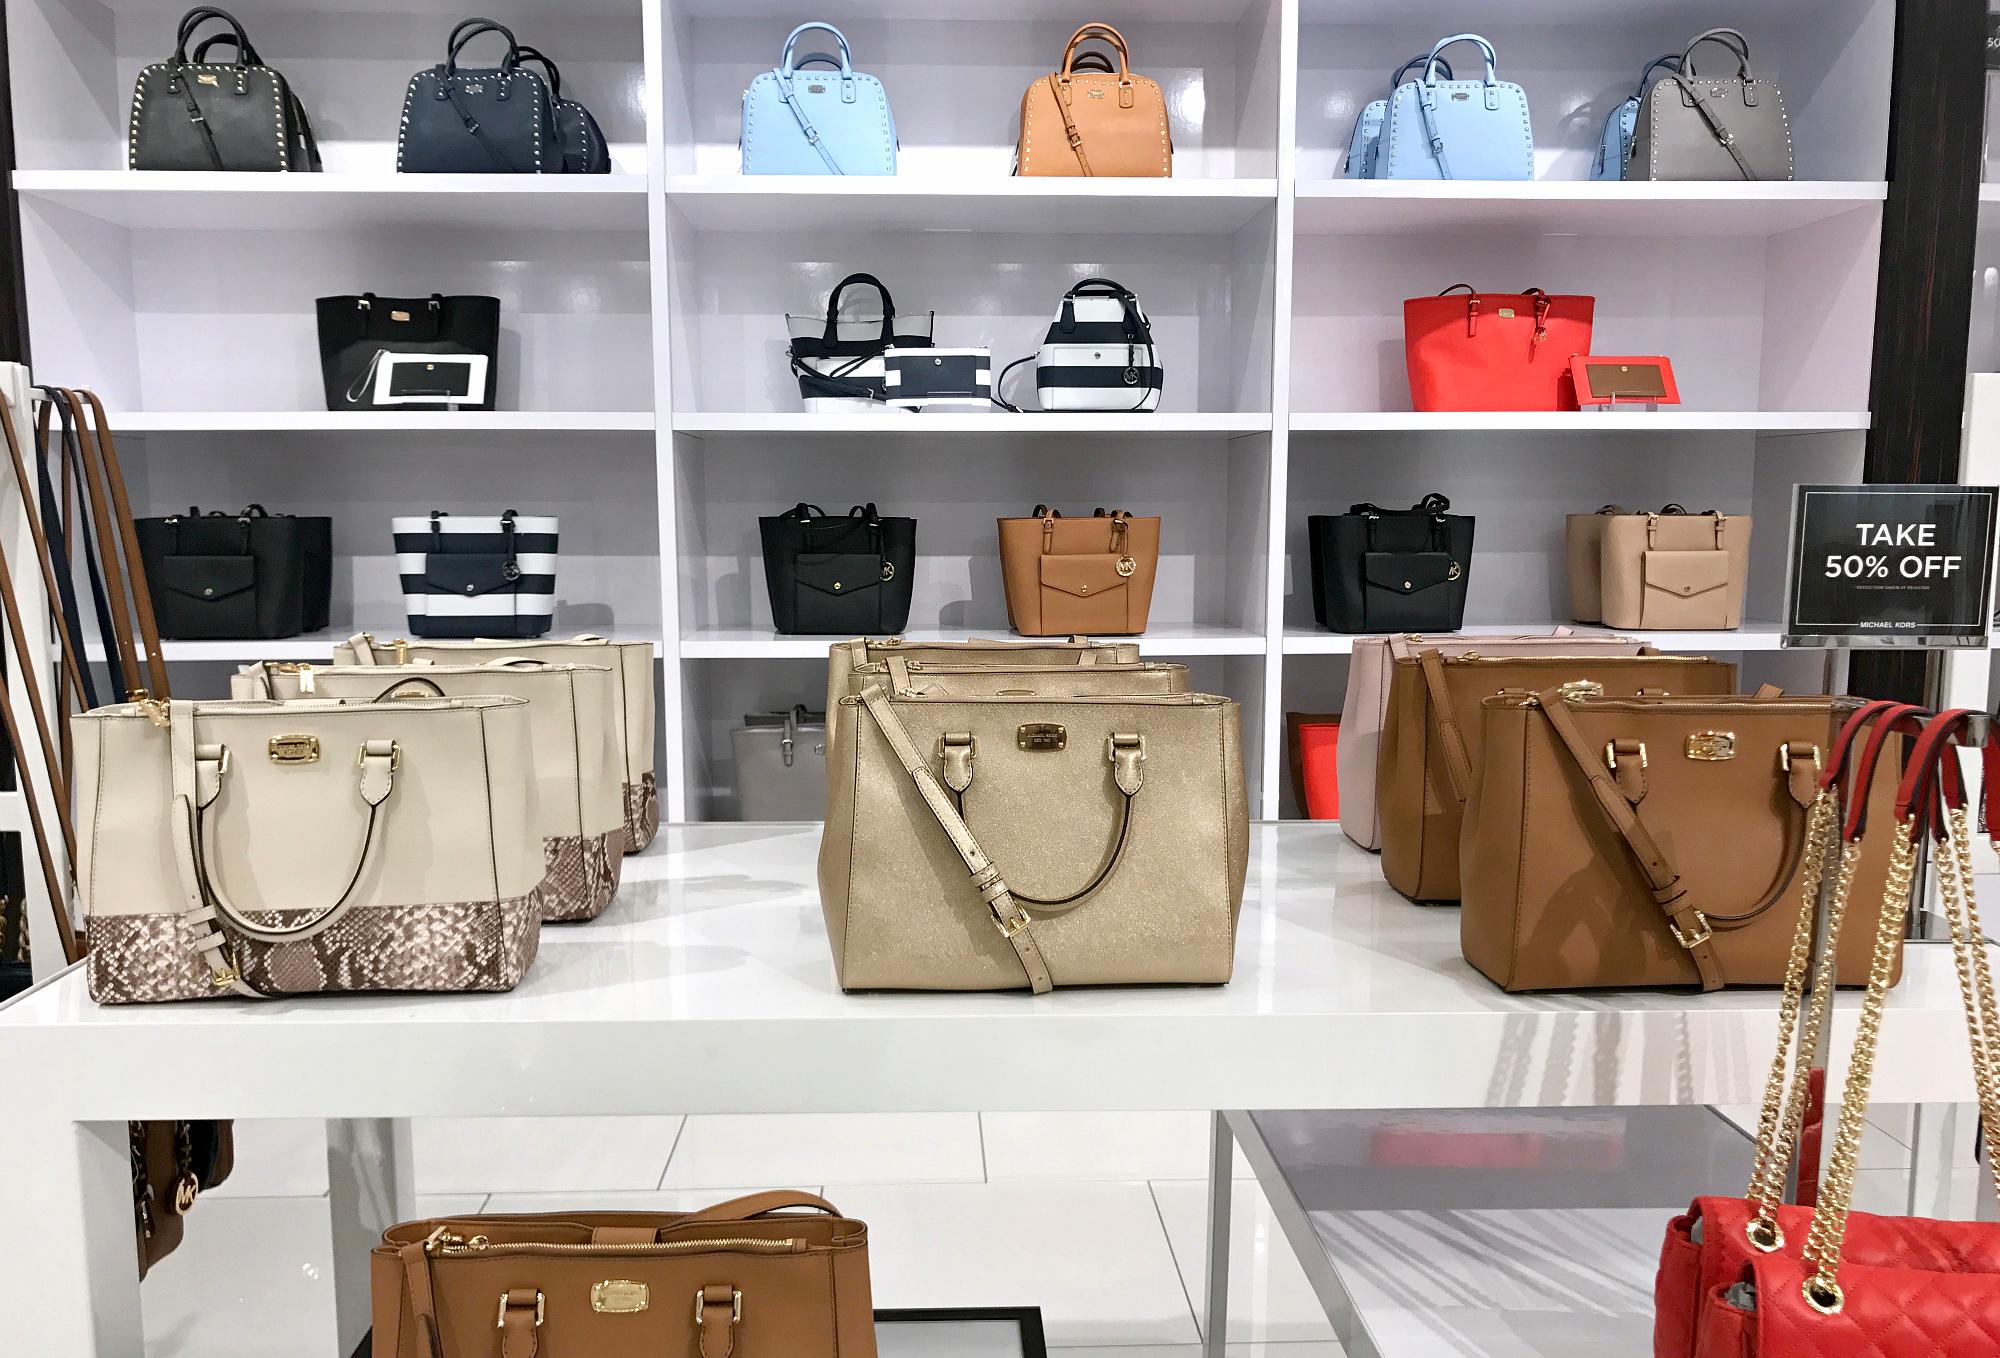 Mother's Day Gift Idea: Michael Kors Handbag